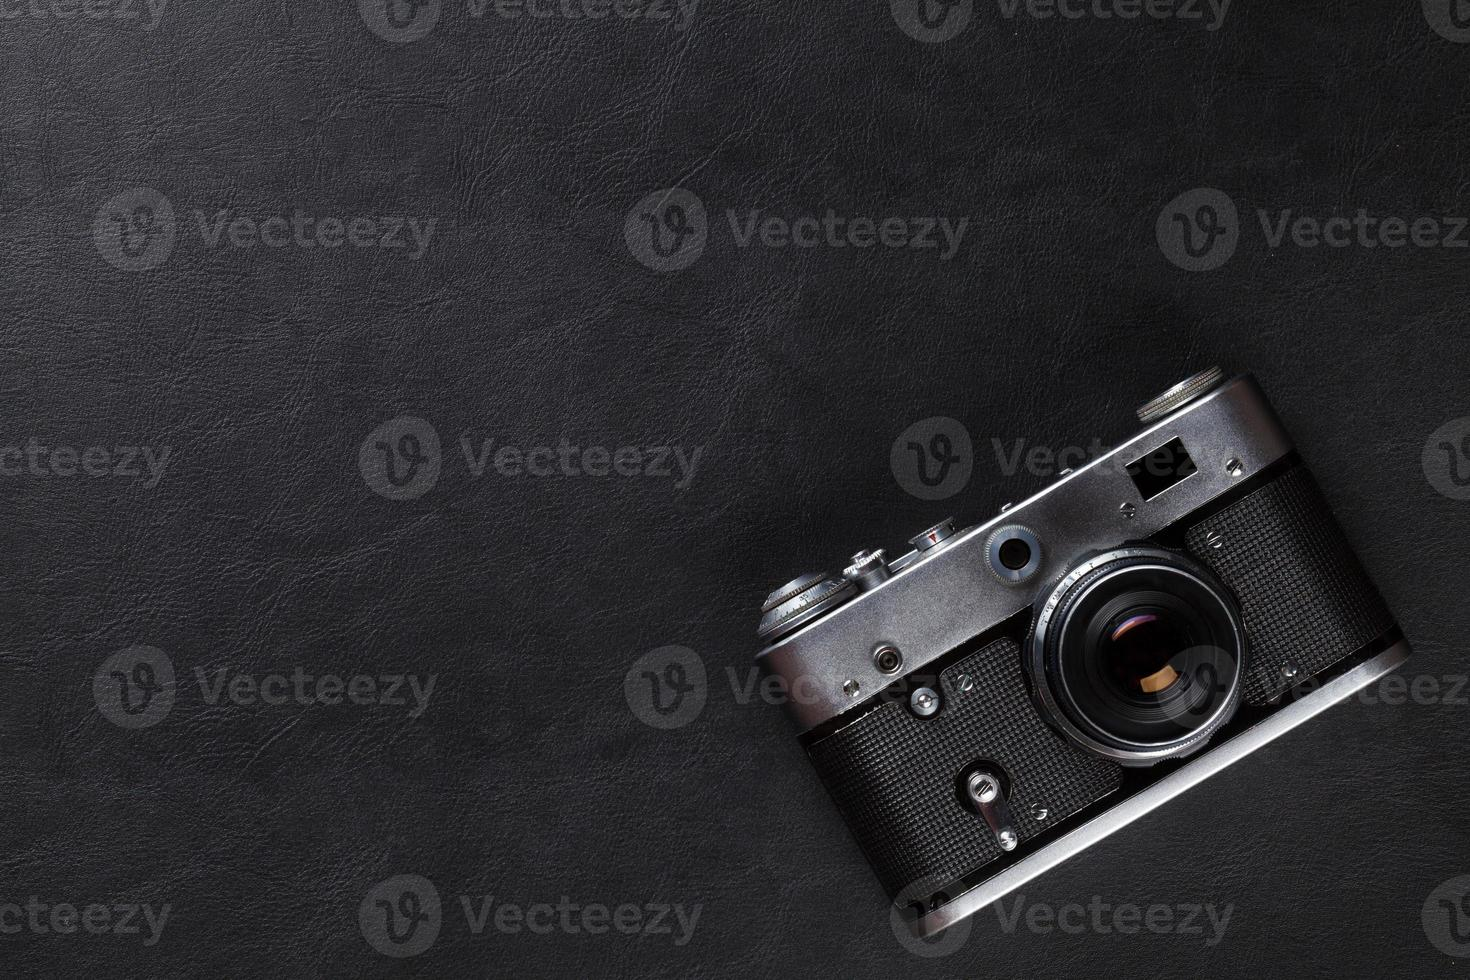 vintage filmkamera över läderbord foto